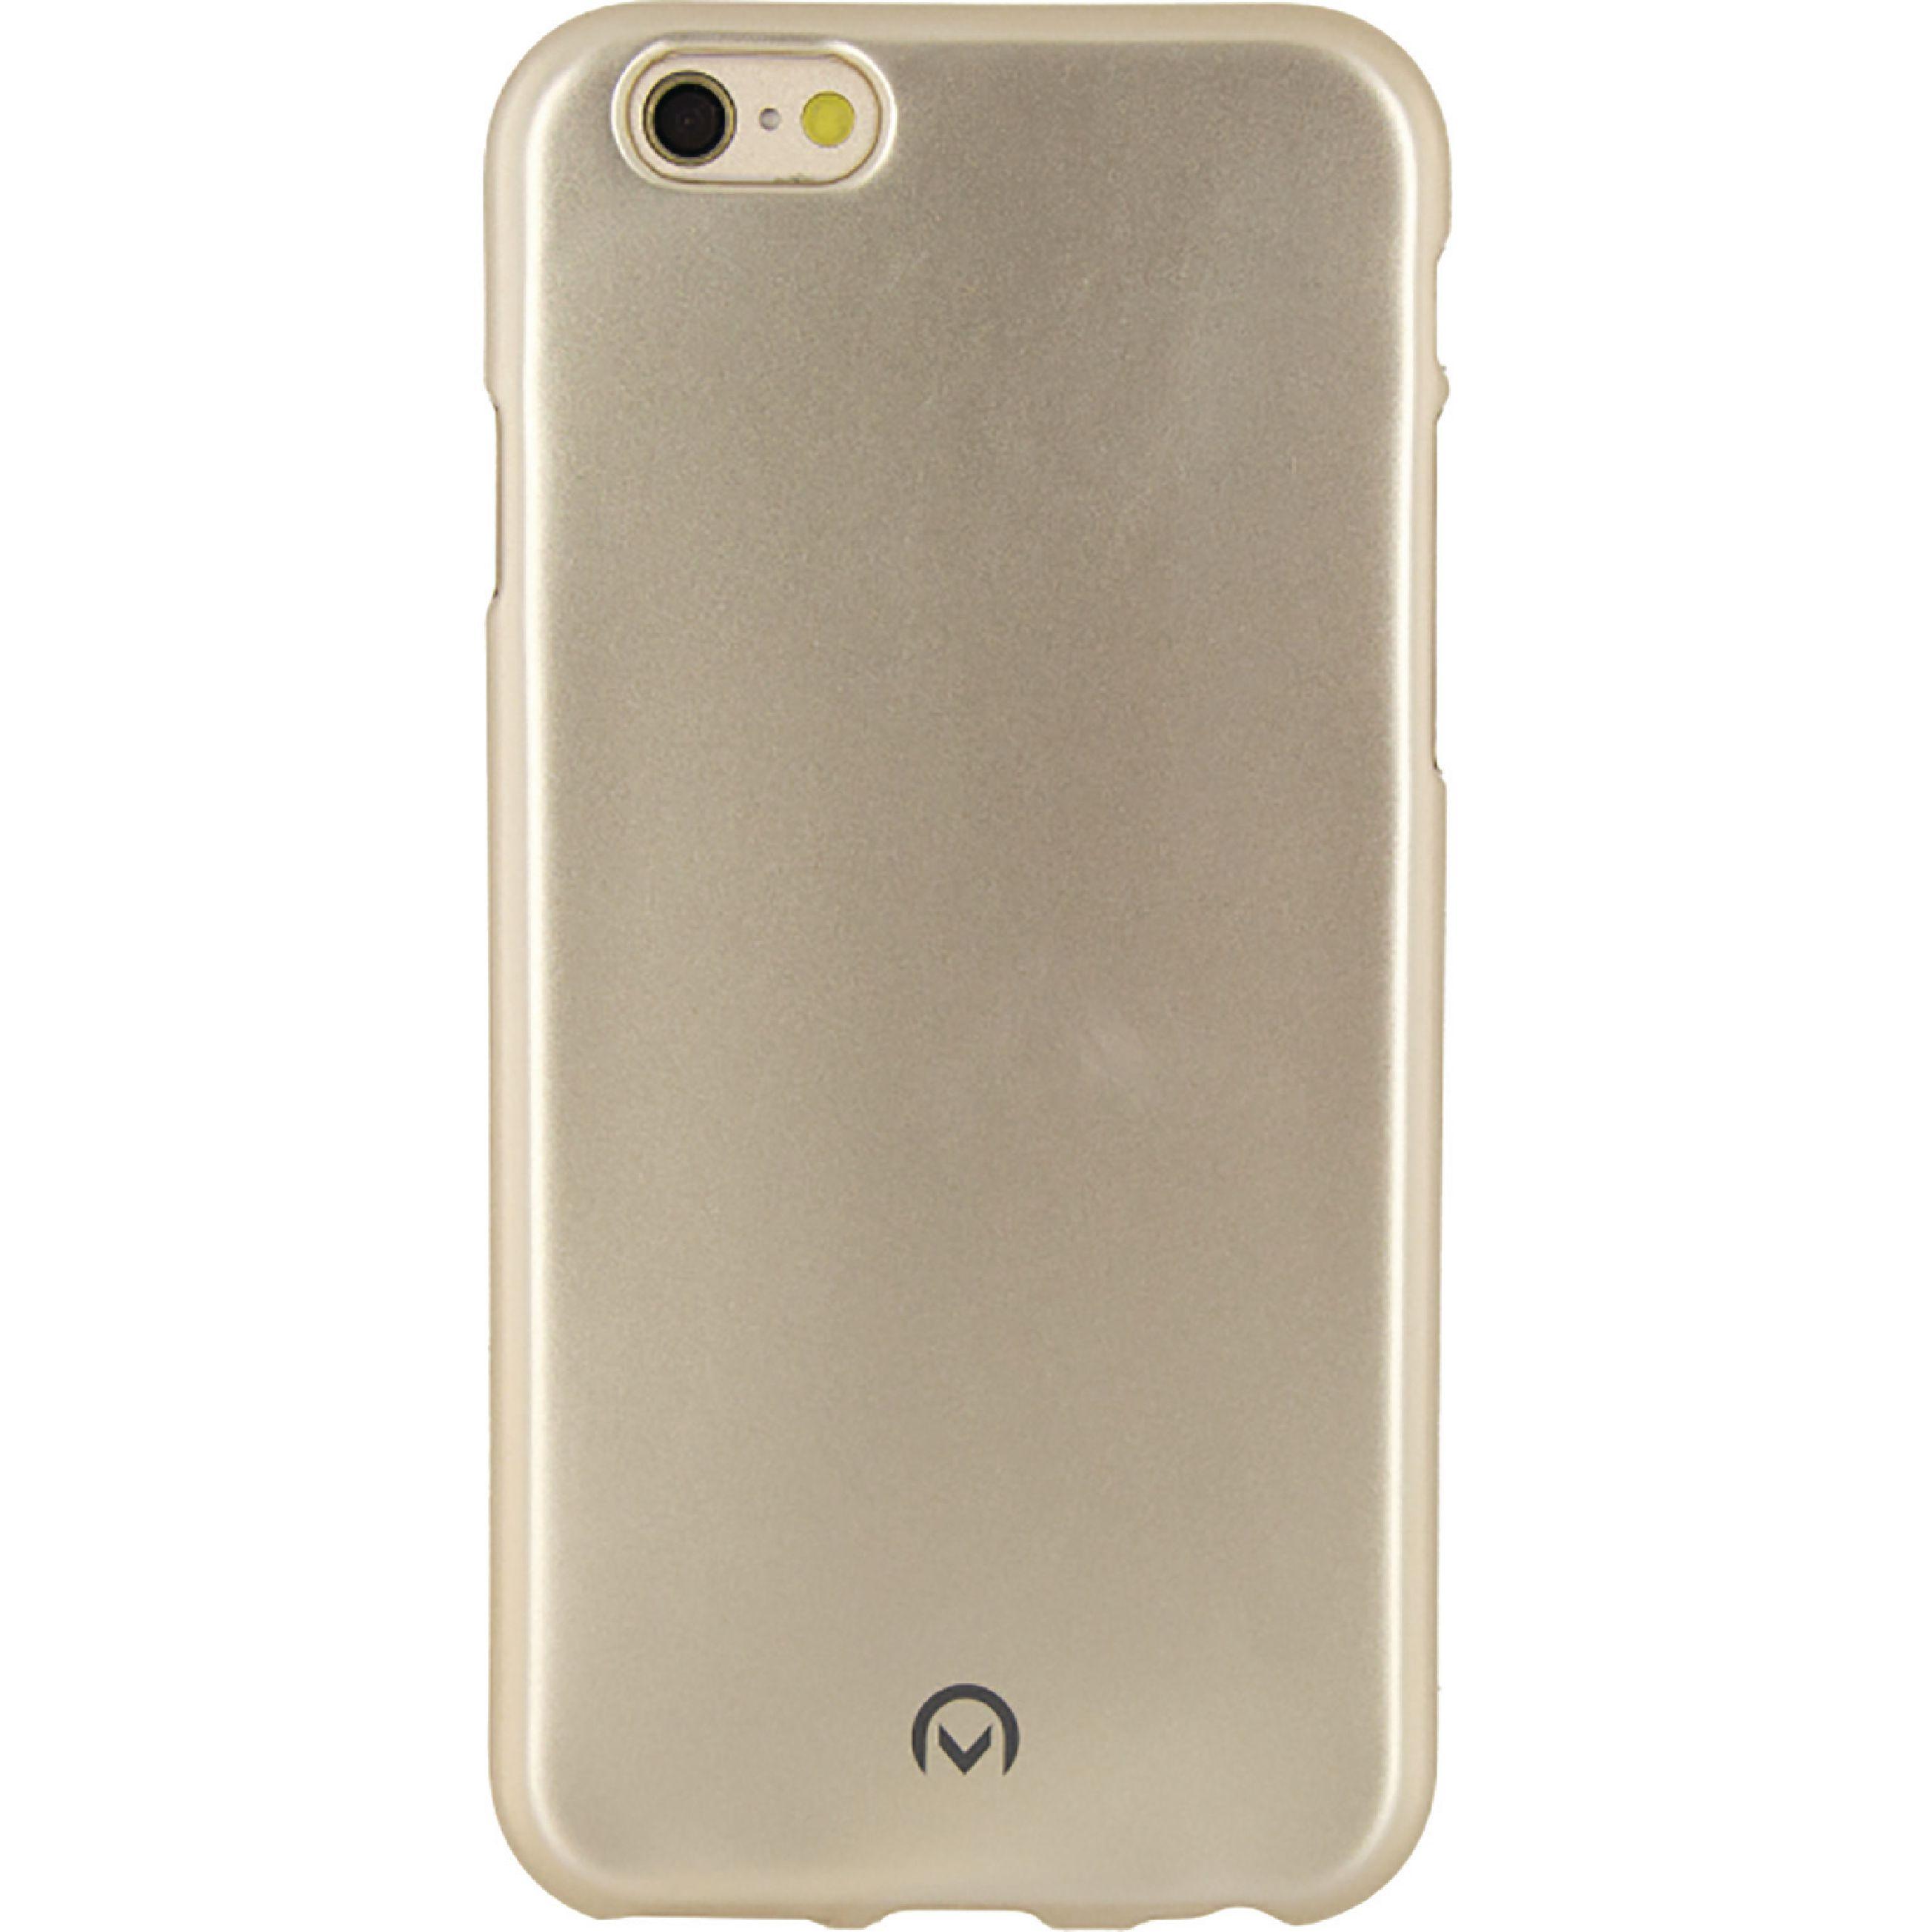 Image of   Telefon Metallisk Blødt Etui Apple iPhone 6 / 6s Guld